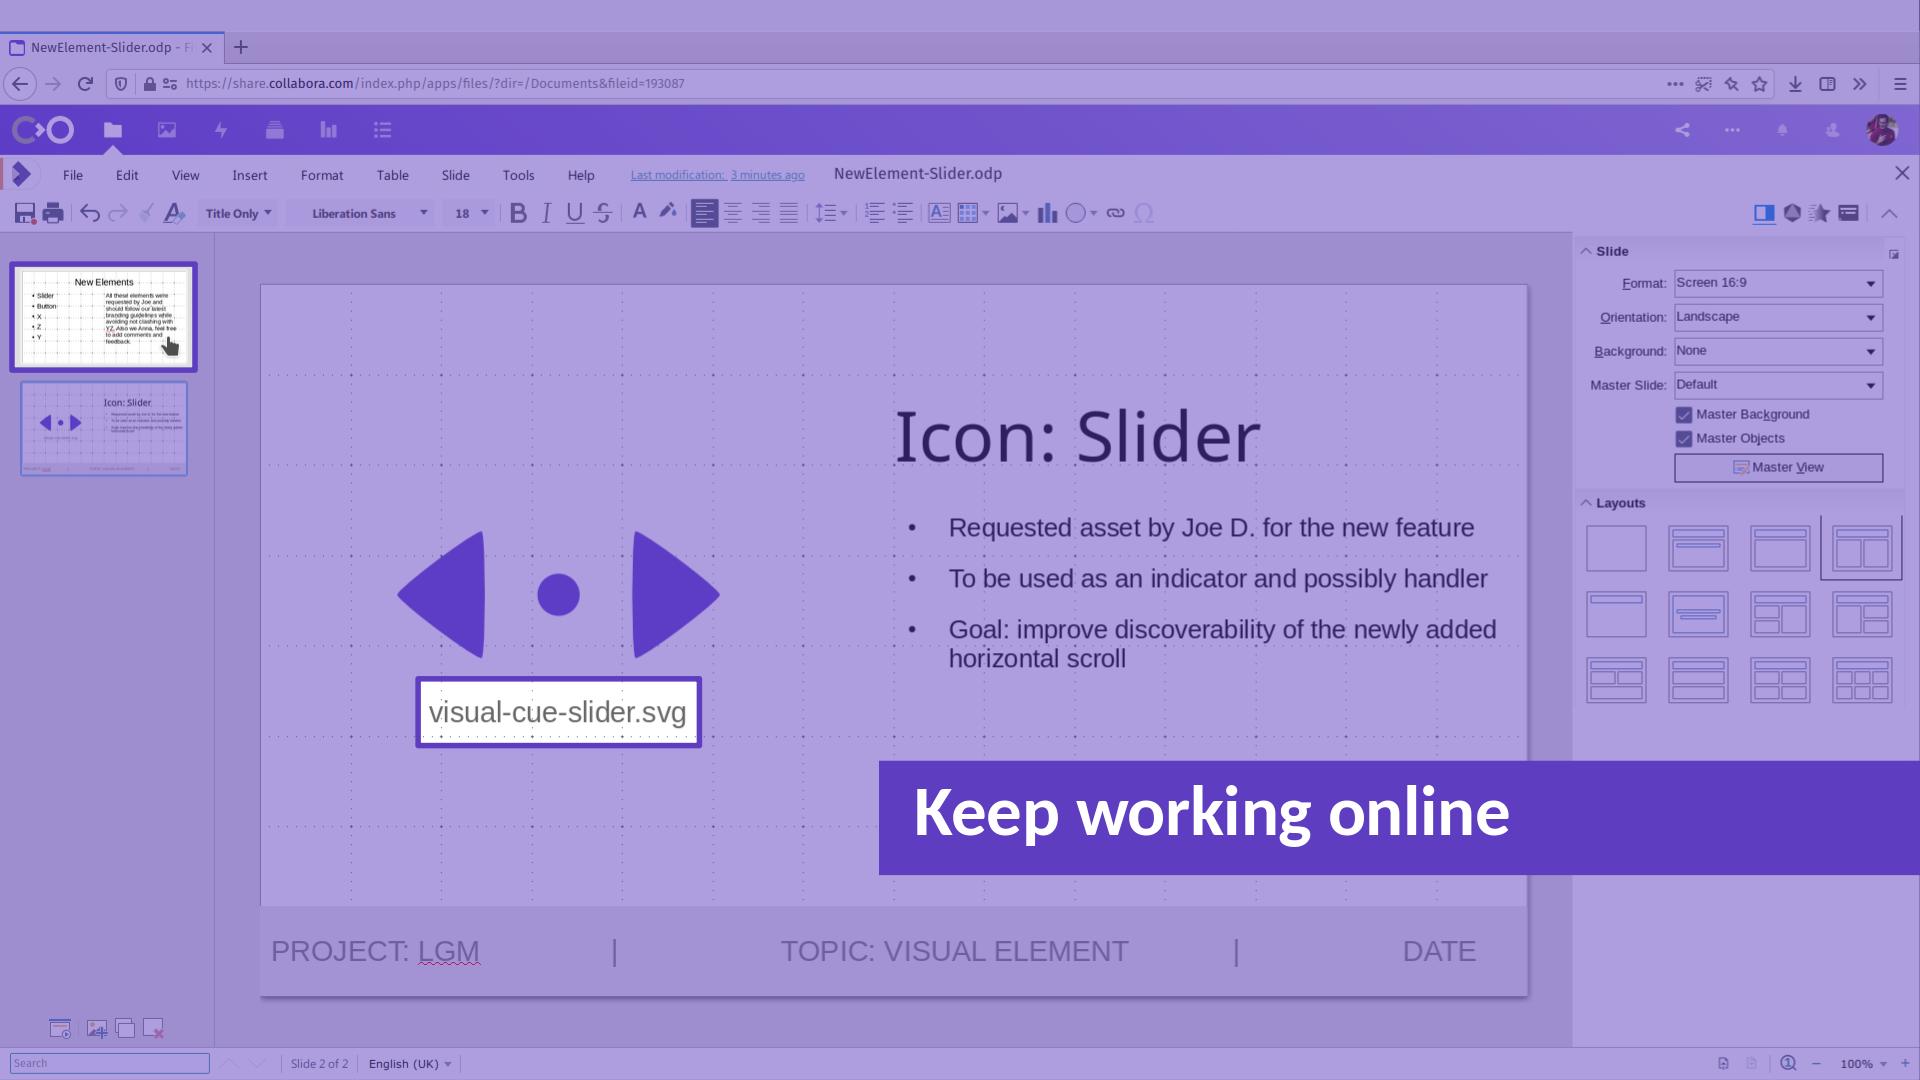 LGM2020 slide: Keep working online